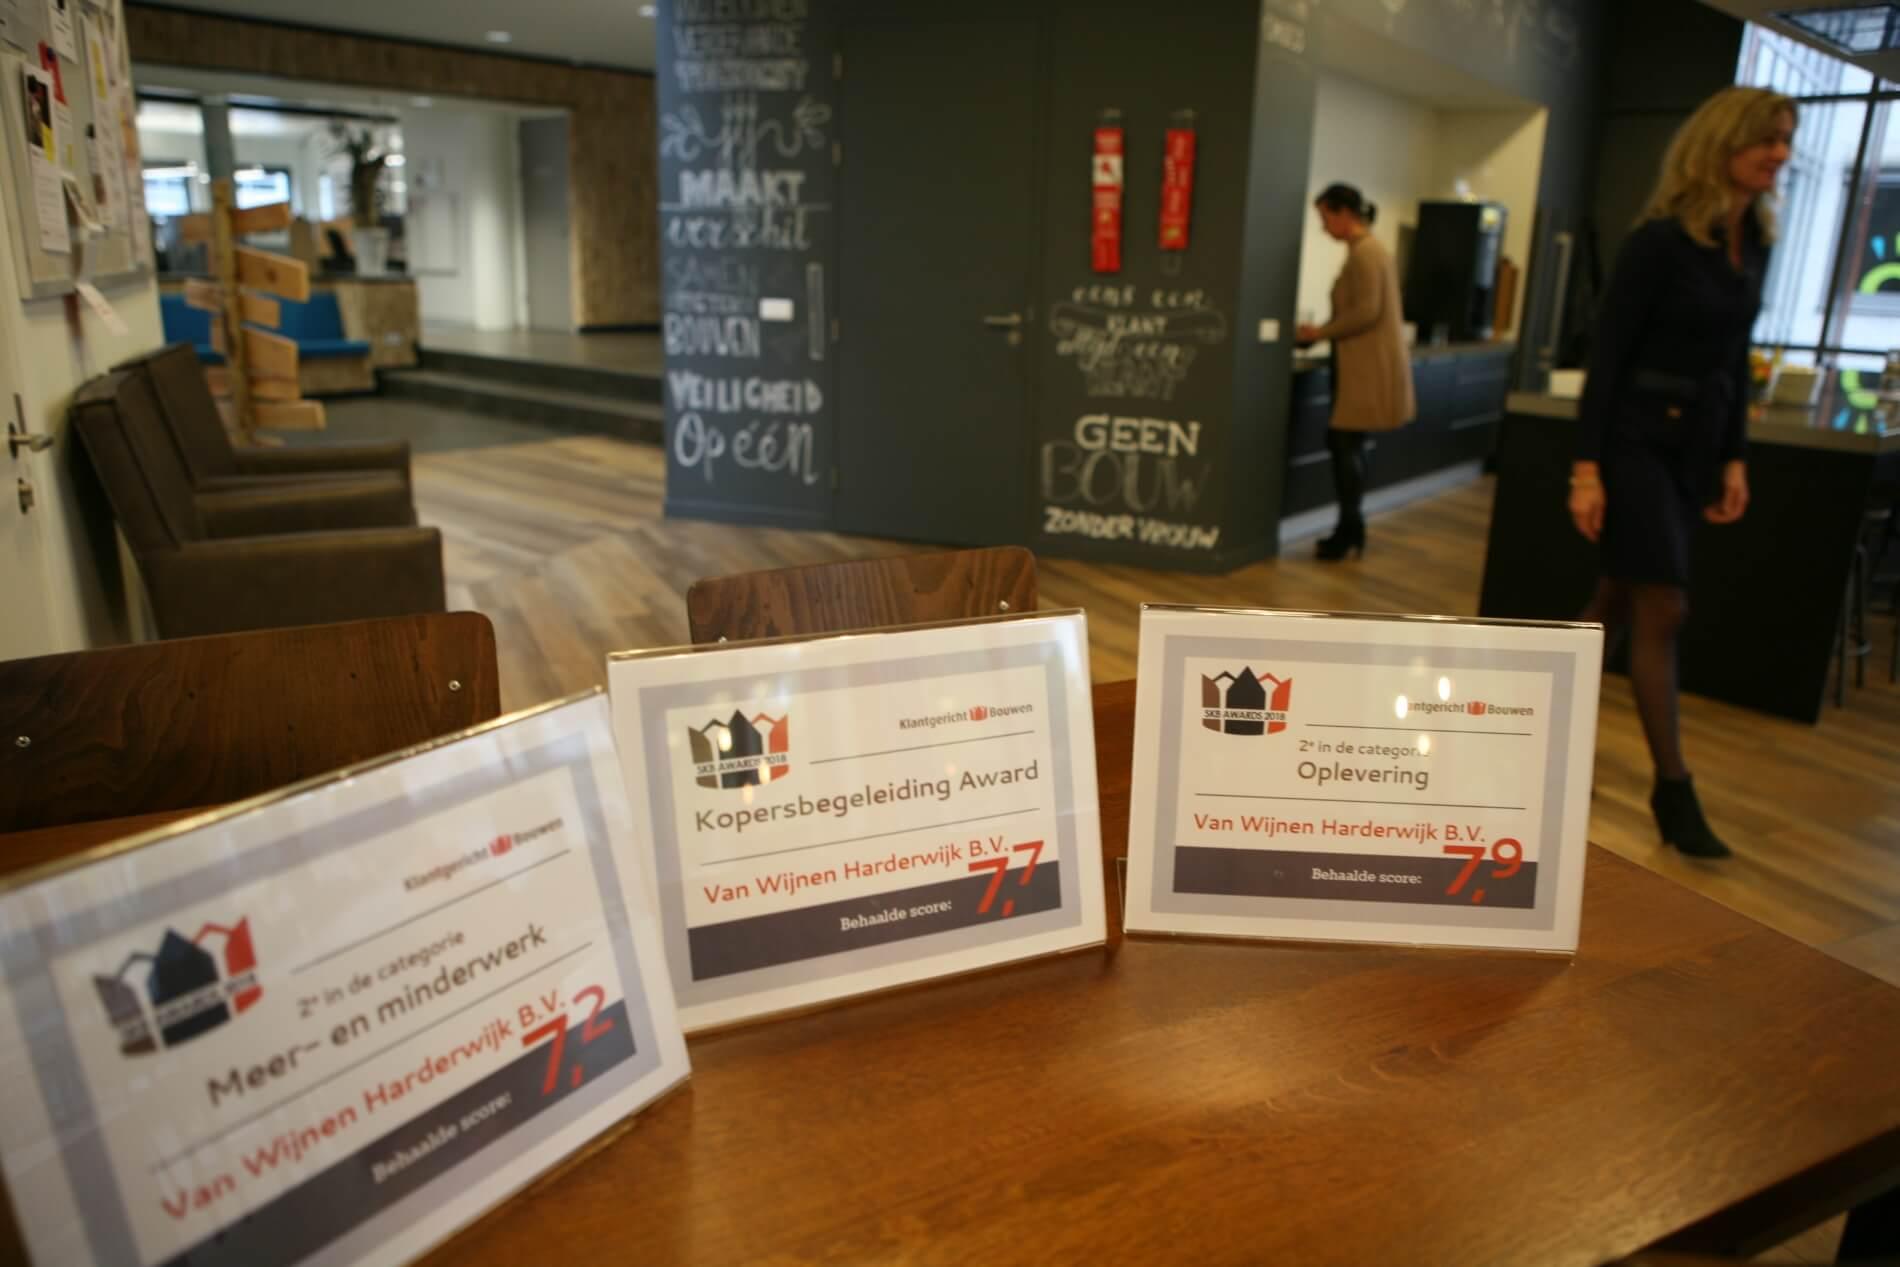 Kopersbegeleiding Award 2018 (4)